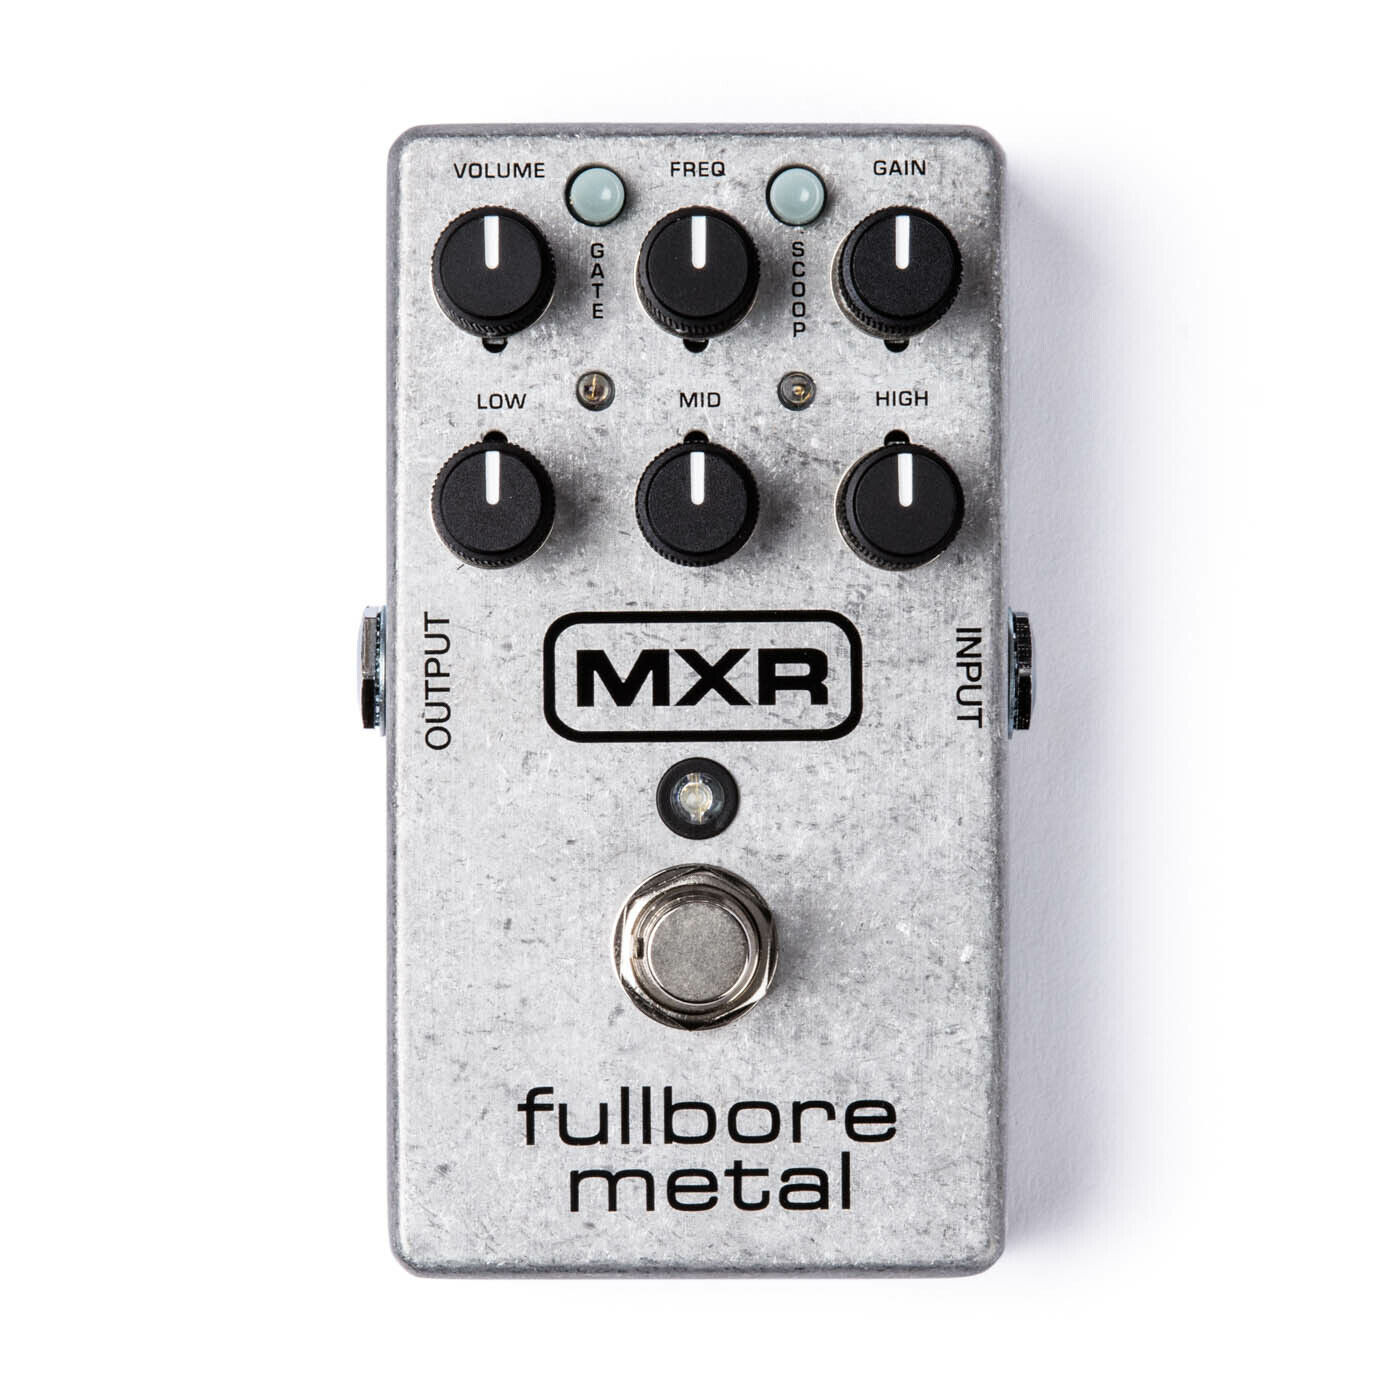 MXR M116 Fullbore Metal Distortion Pedal FREE SHIPPING USA